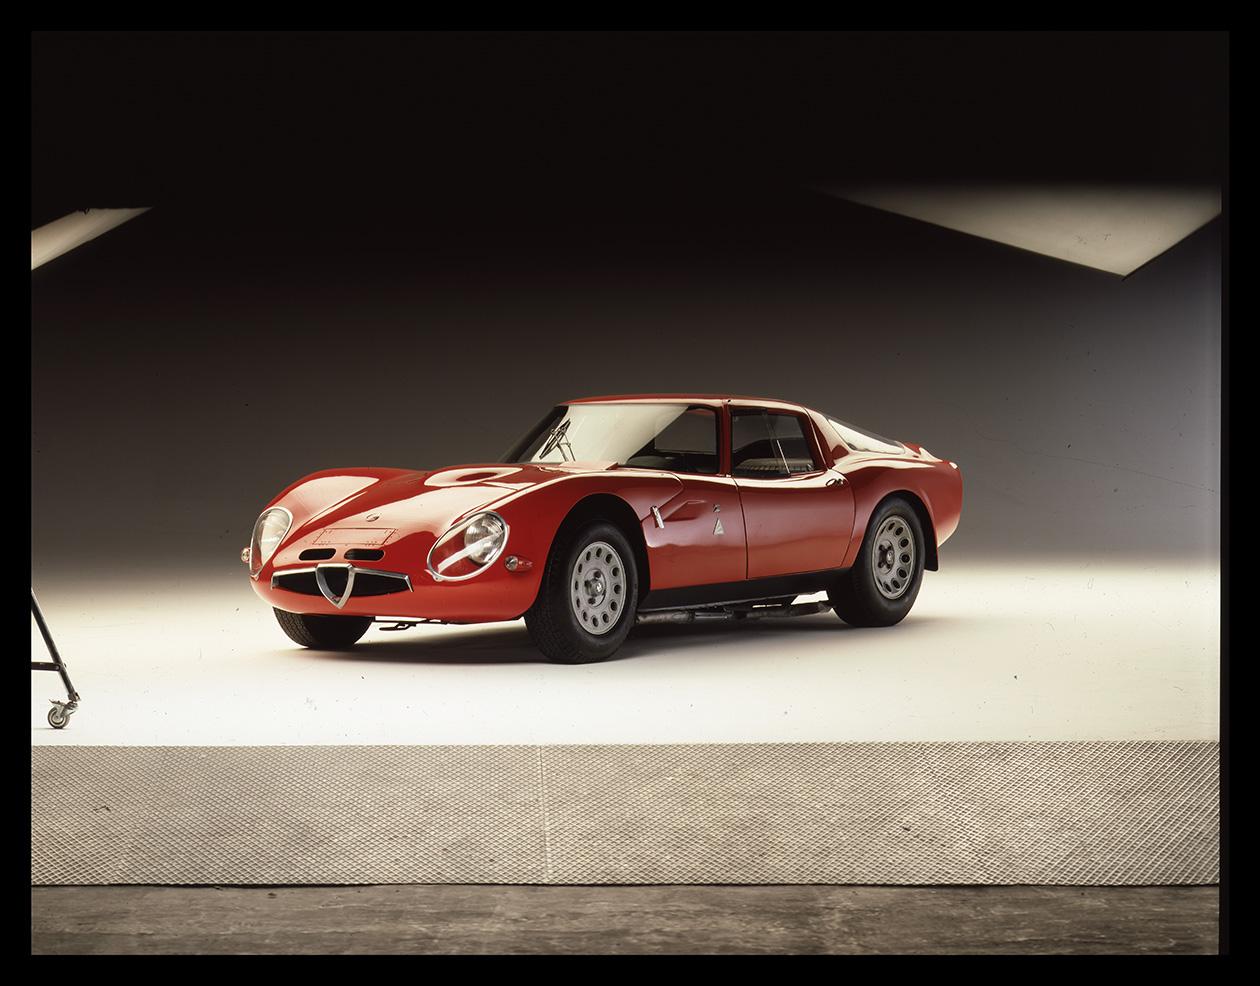 Giulia%2BTZ Δεν γνωρίζεις τι εστί Alfa Romeo άμα δεν γνωρίζεις την ιστορία της Alfa, alfa romeo, Alfa Romeo Soul, Alfisti, Giulia, Heritage, museoalfaromeo, videos, zblog